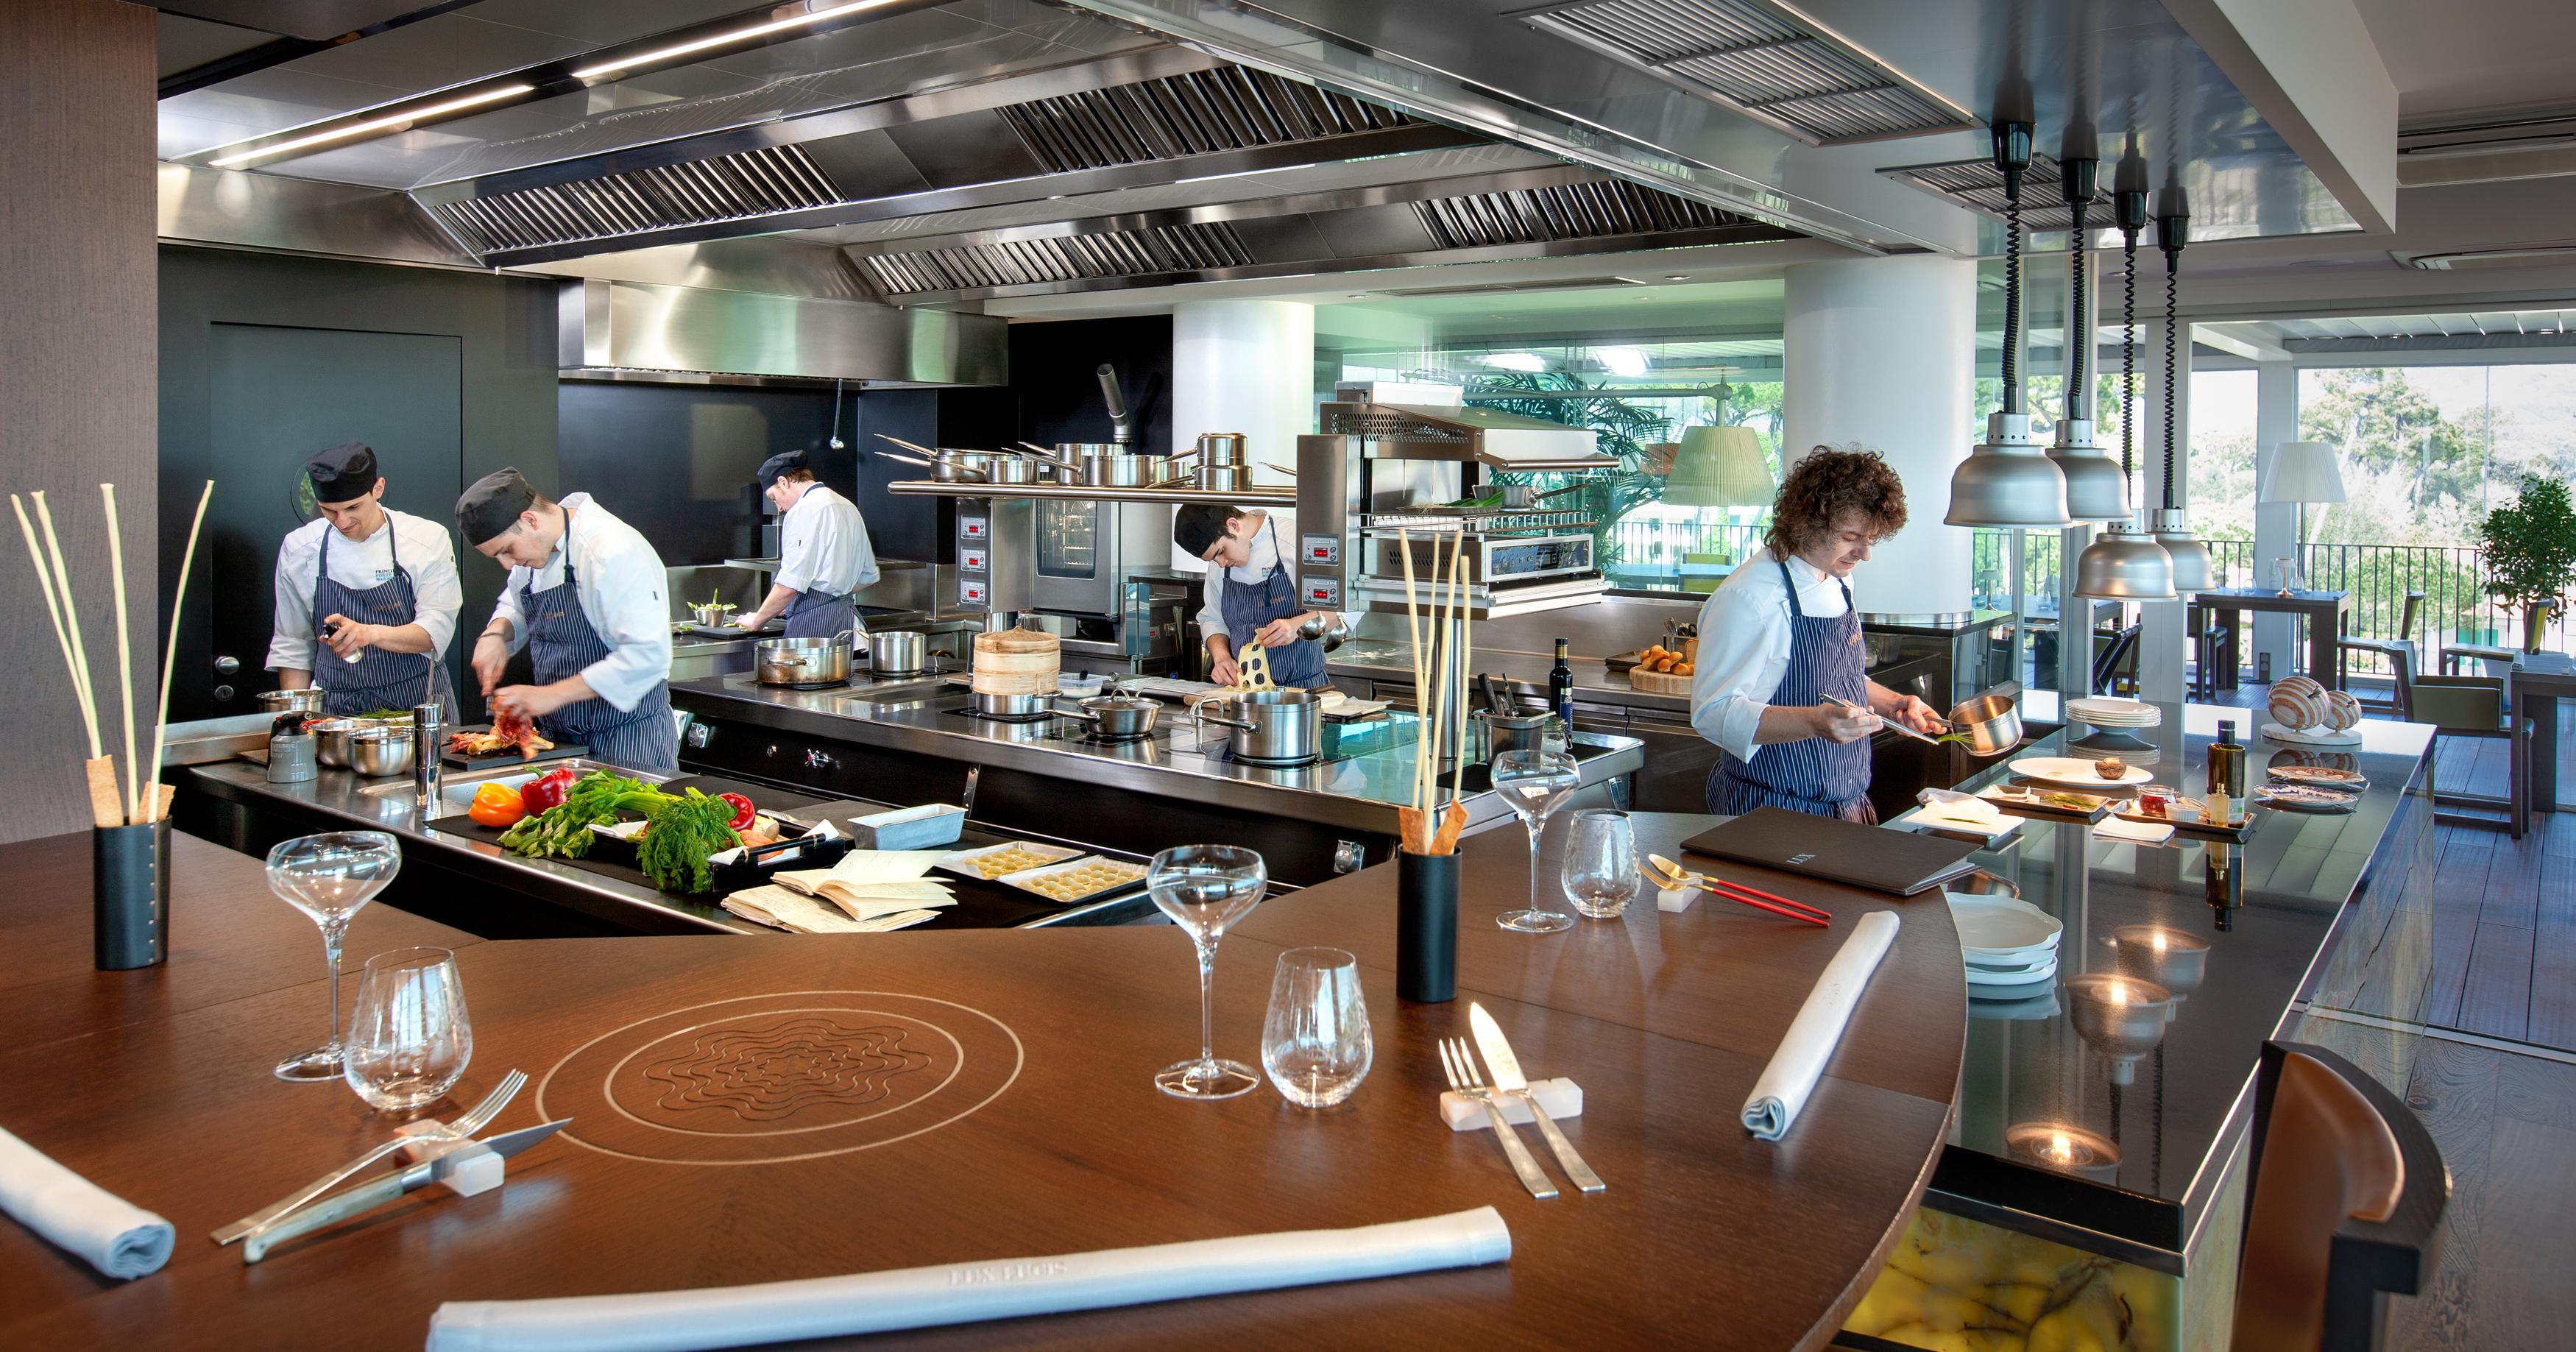 Lux Lucis kitchen